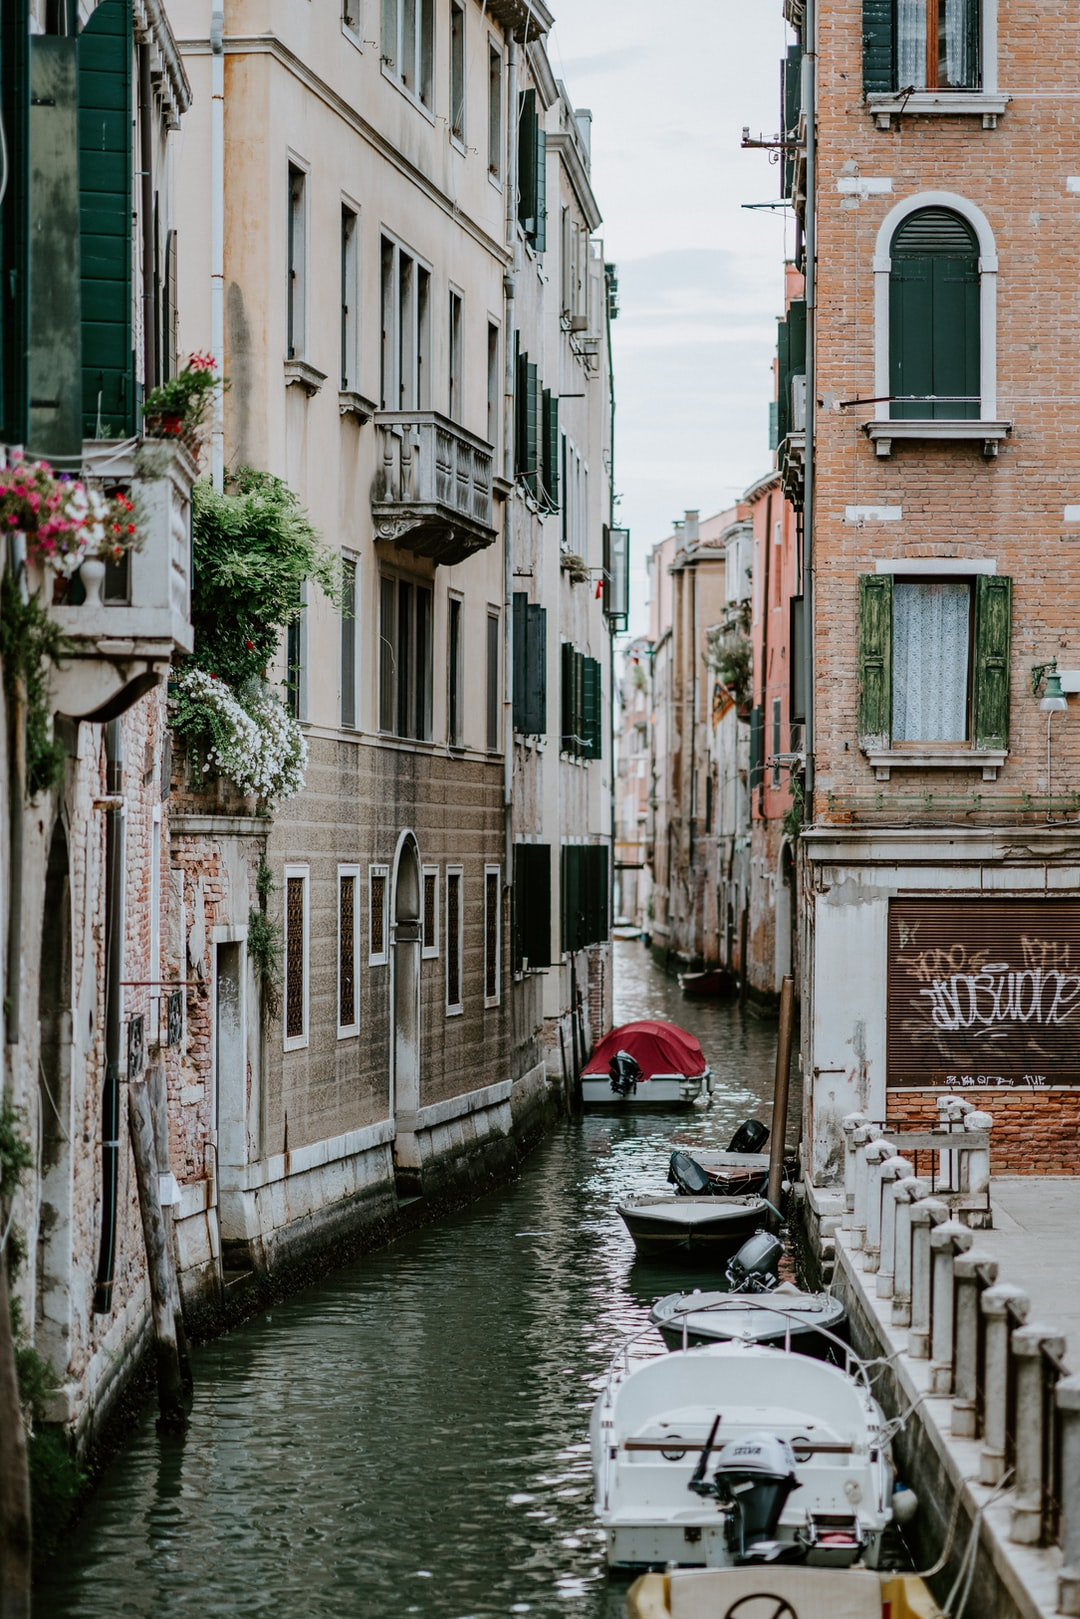 Venice canal, curving round corner